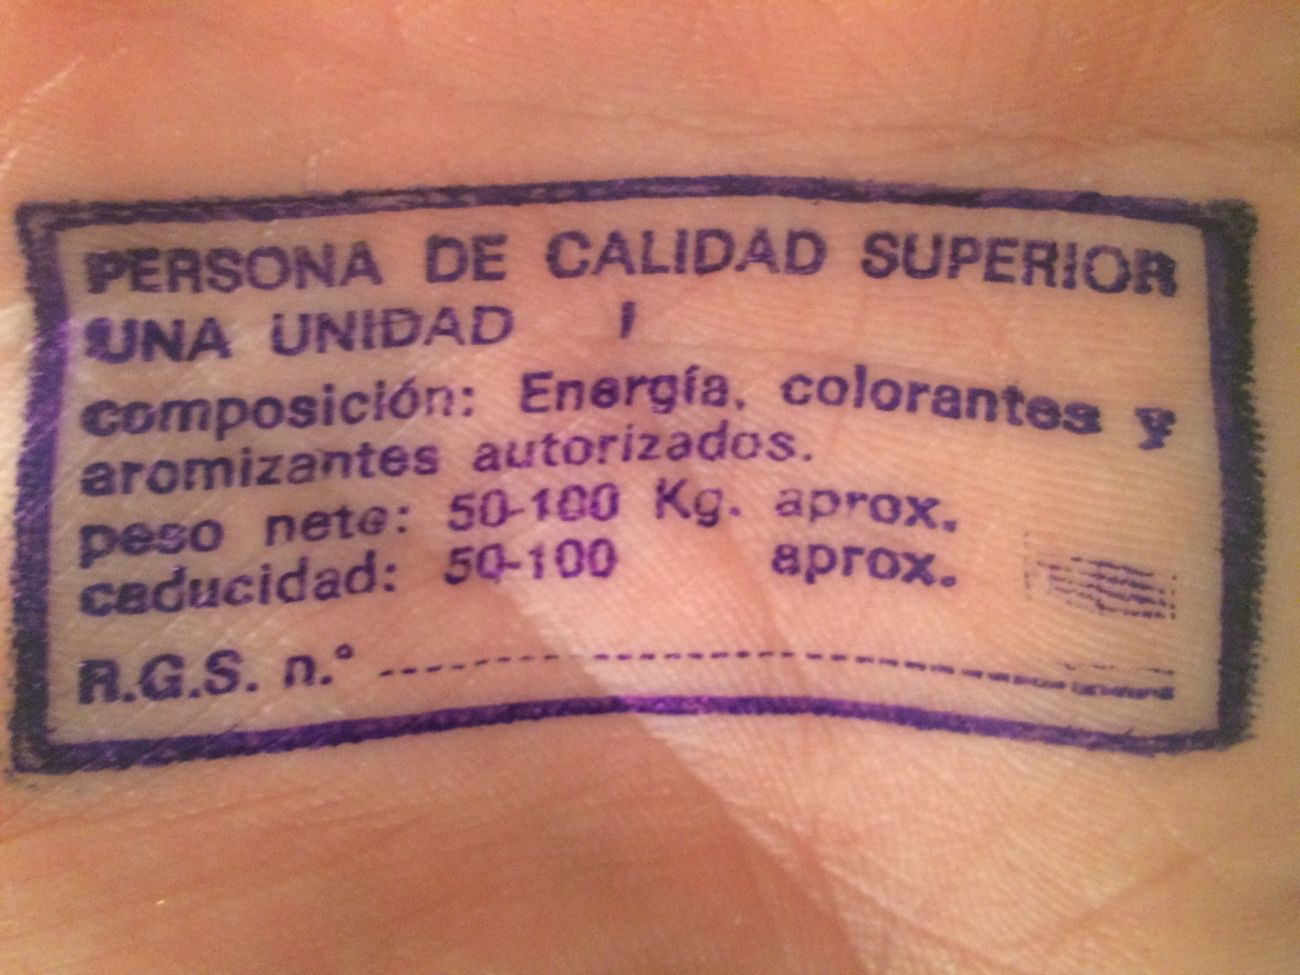 Quality Purita Verdad!